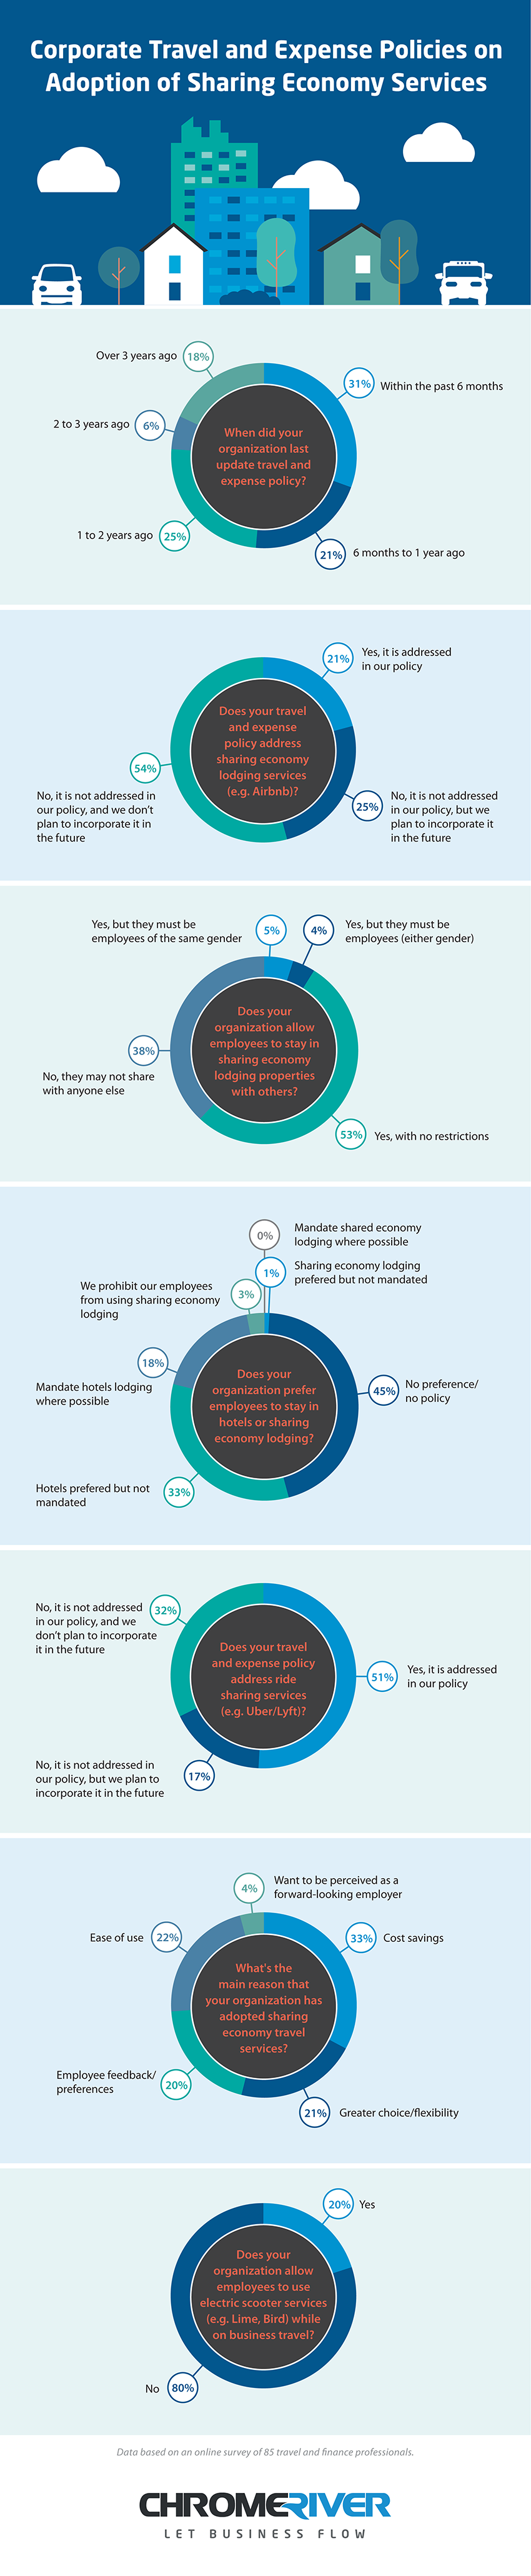 Sharing Economy Business Policy Statistics